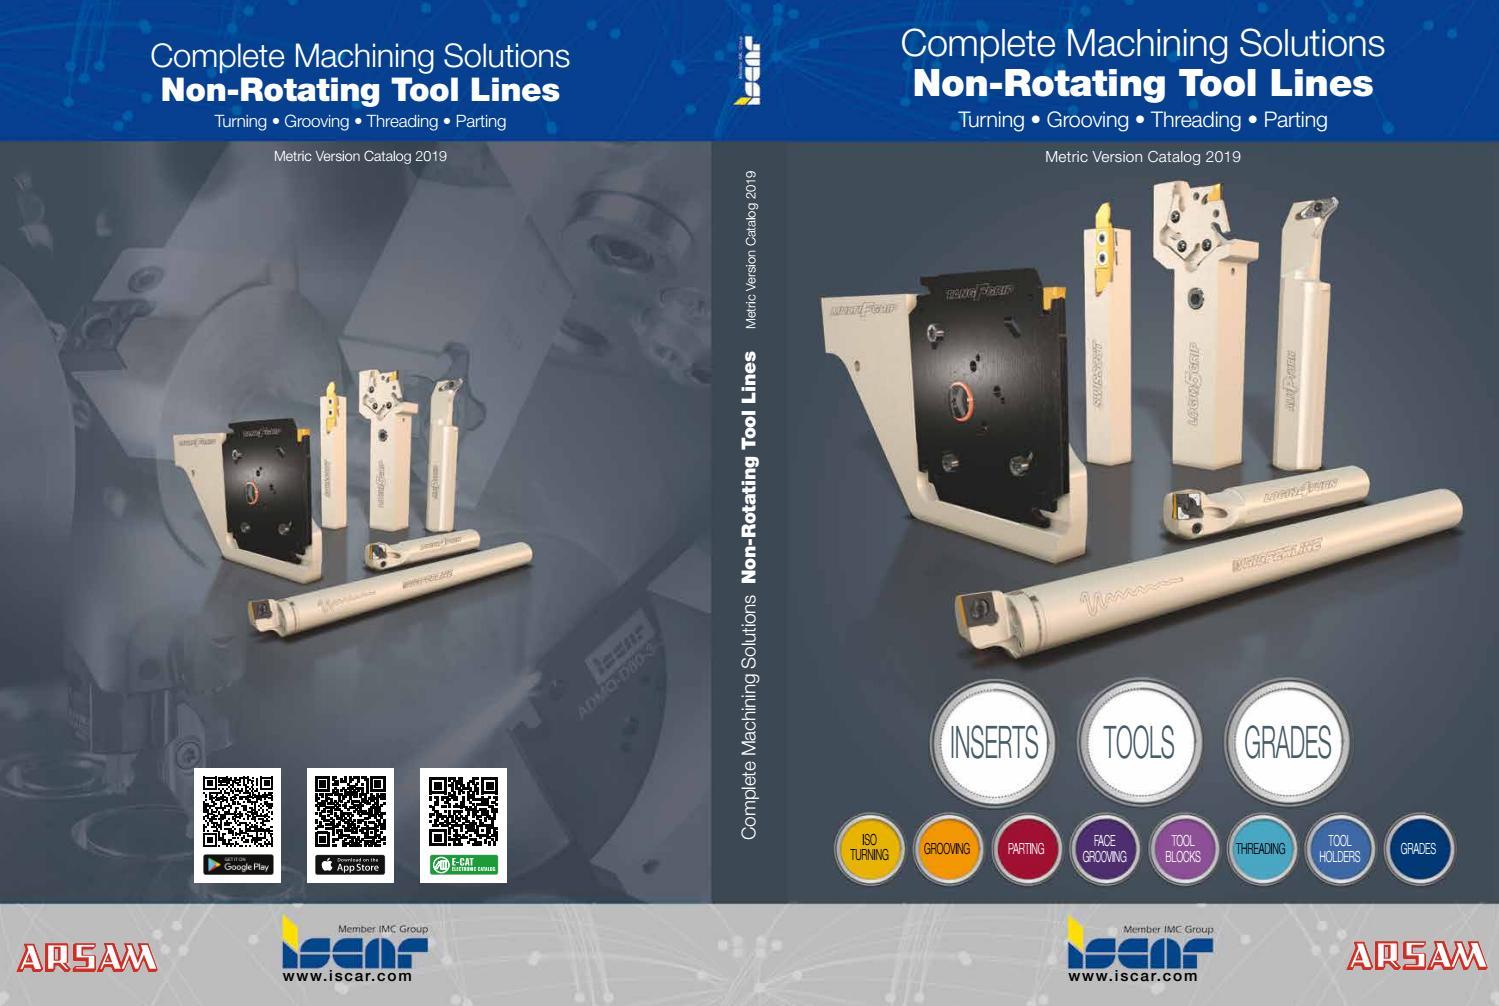 10 pcs ISCAR DCMT 3-2-SM DCMT 11T308-SM Grade IC907 Carbide inserts